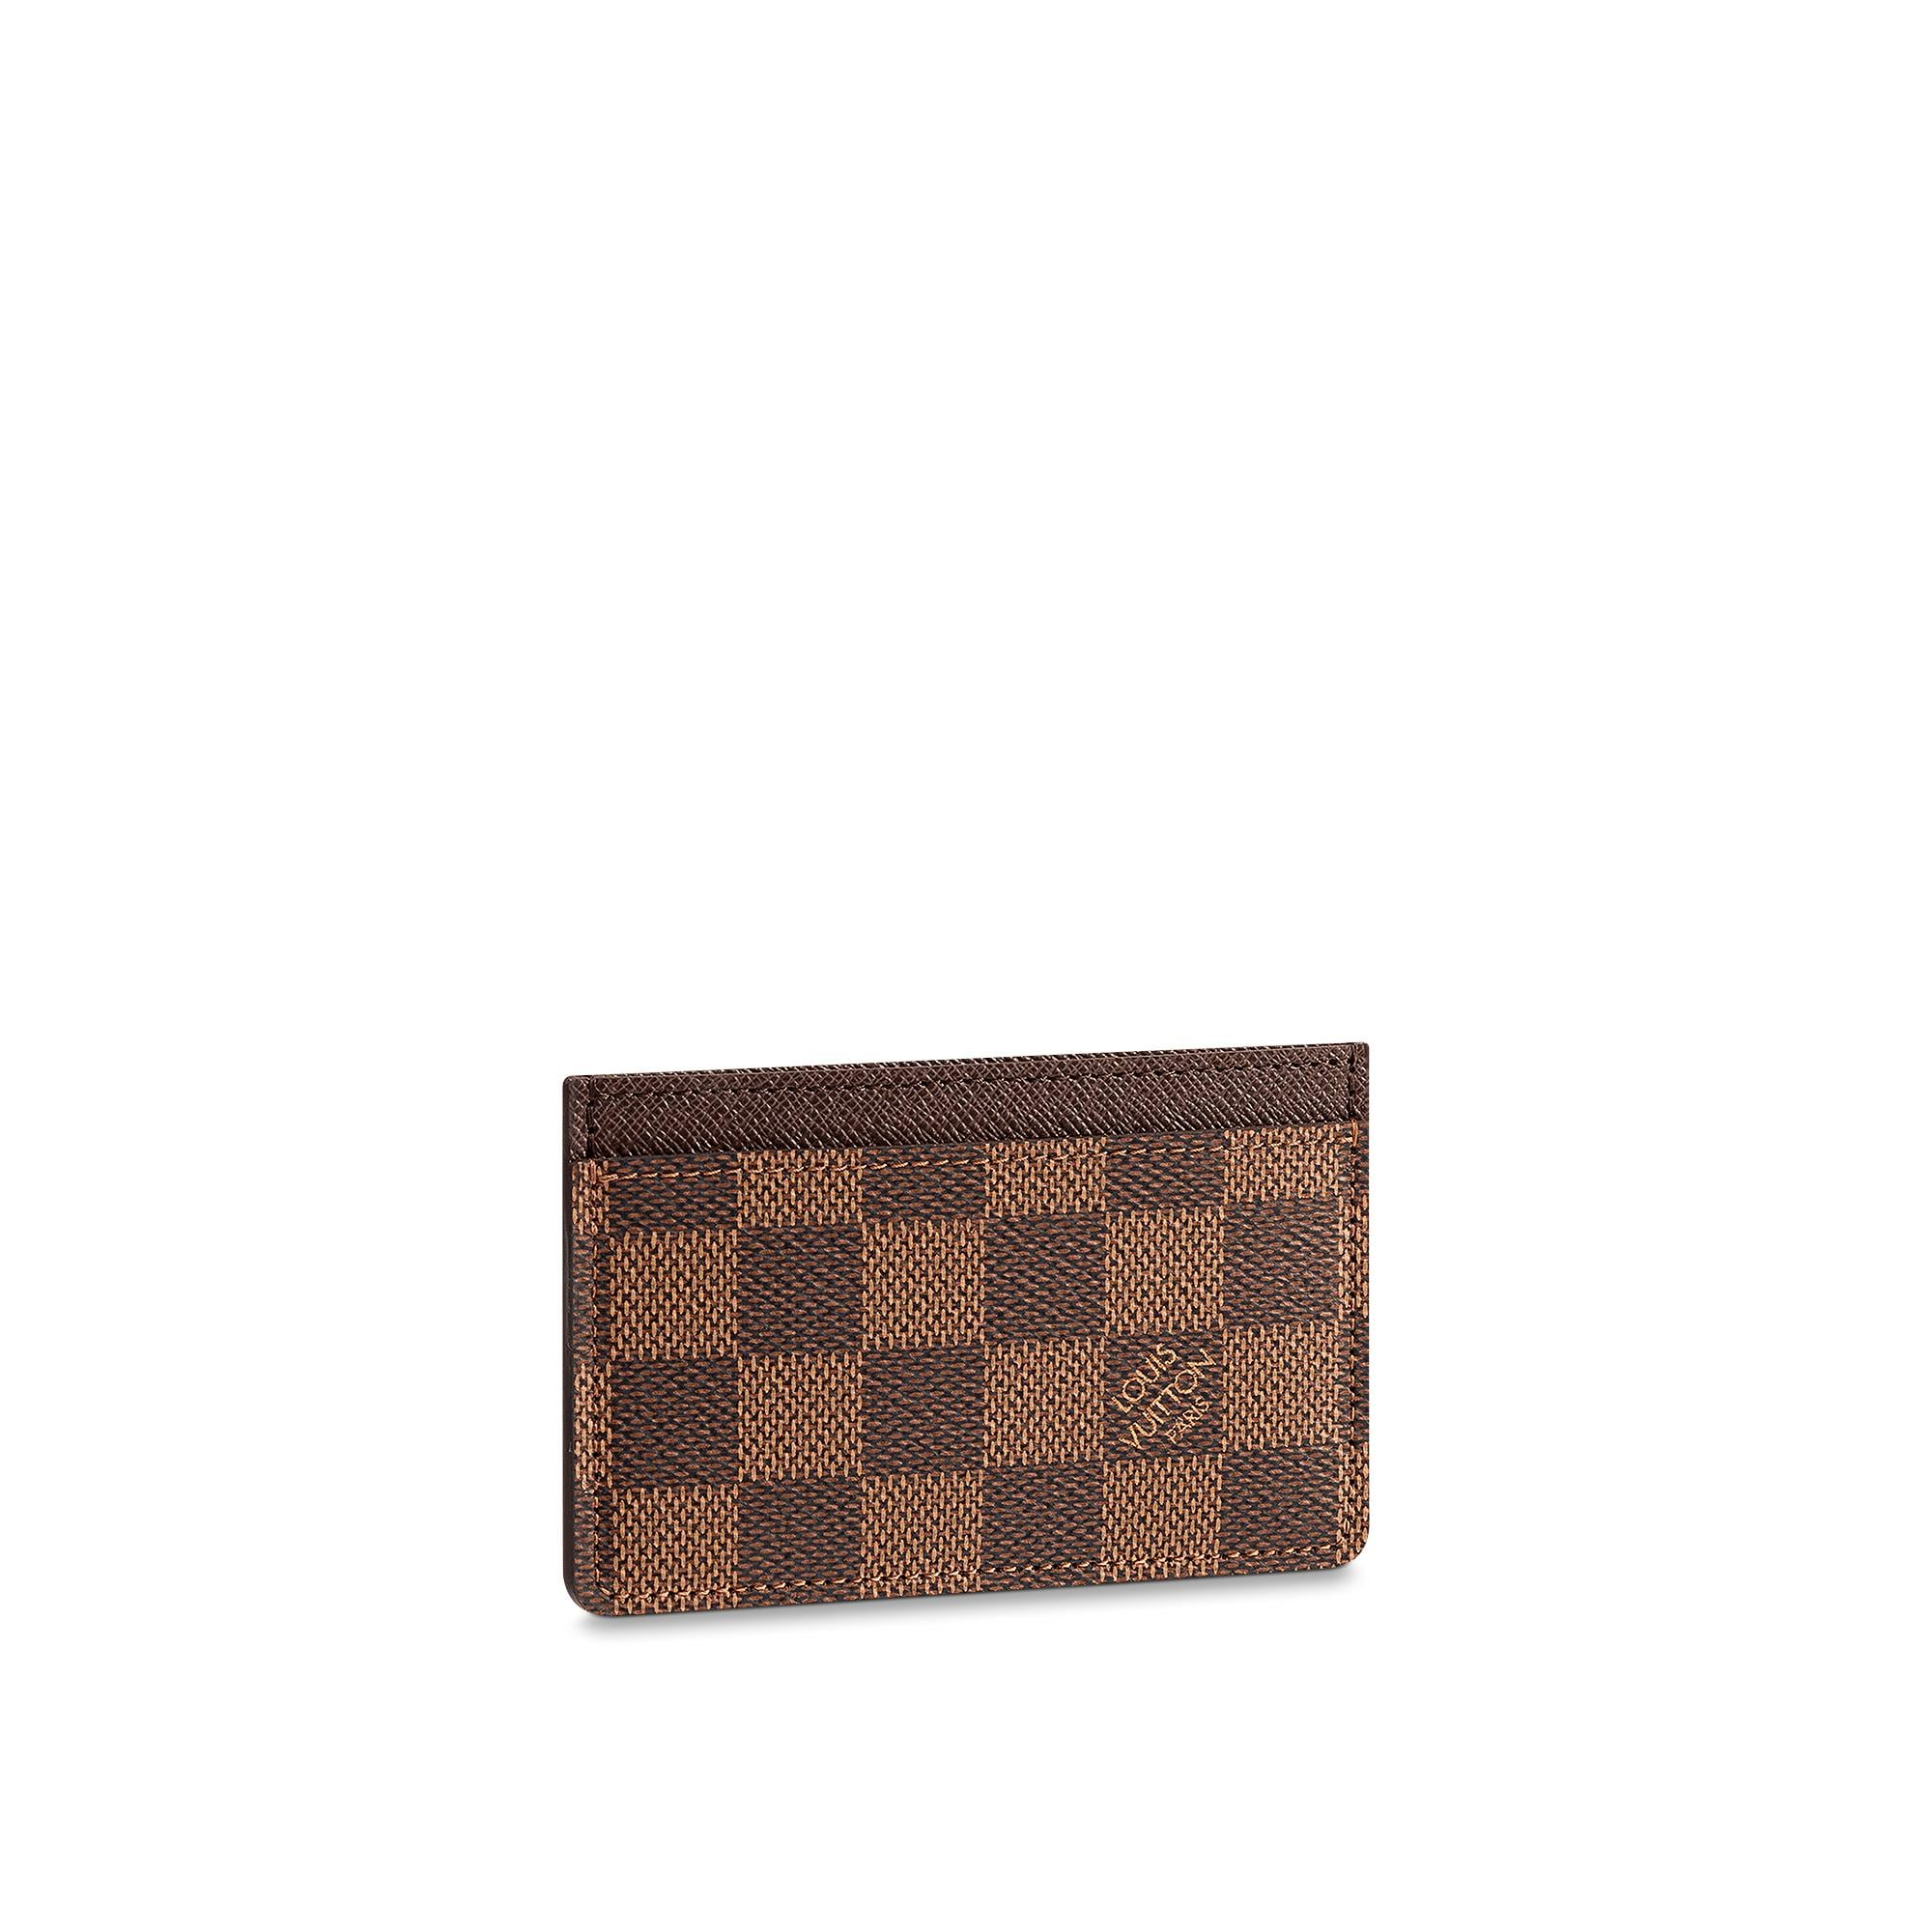 Christmas  Small Leather Goods Card Holder Damier Ebene Canvas  LOUIS VUITTON